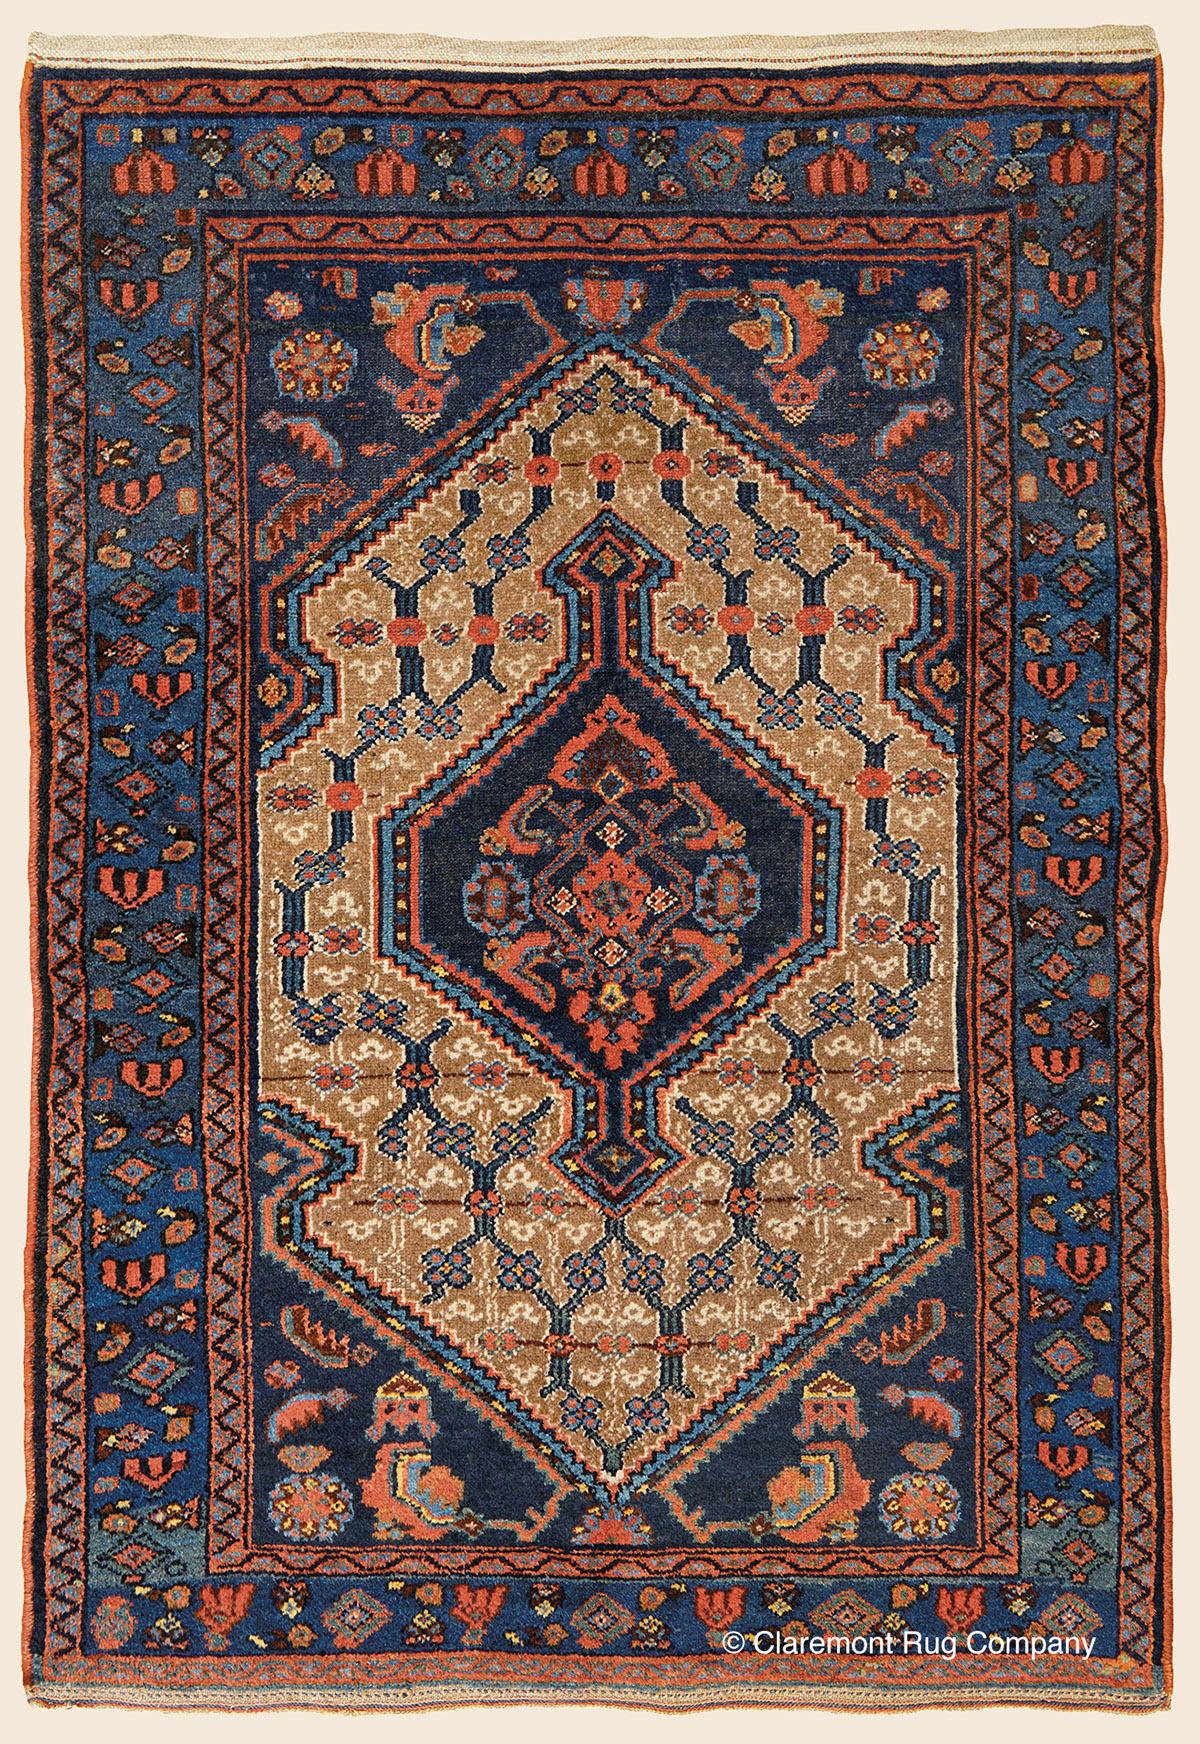 Hamadan Northwest Persian Antique Rug Claremont Rug Company